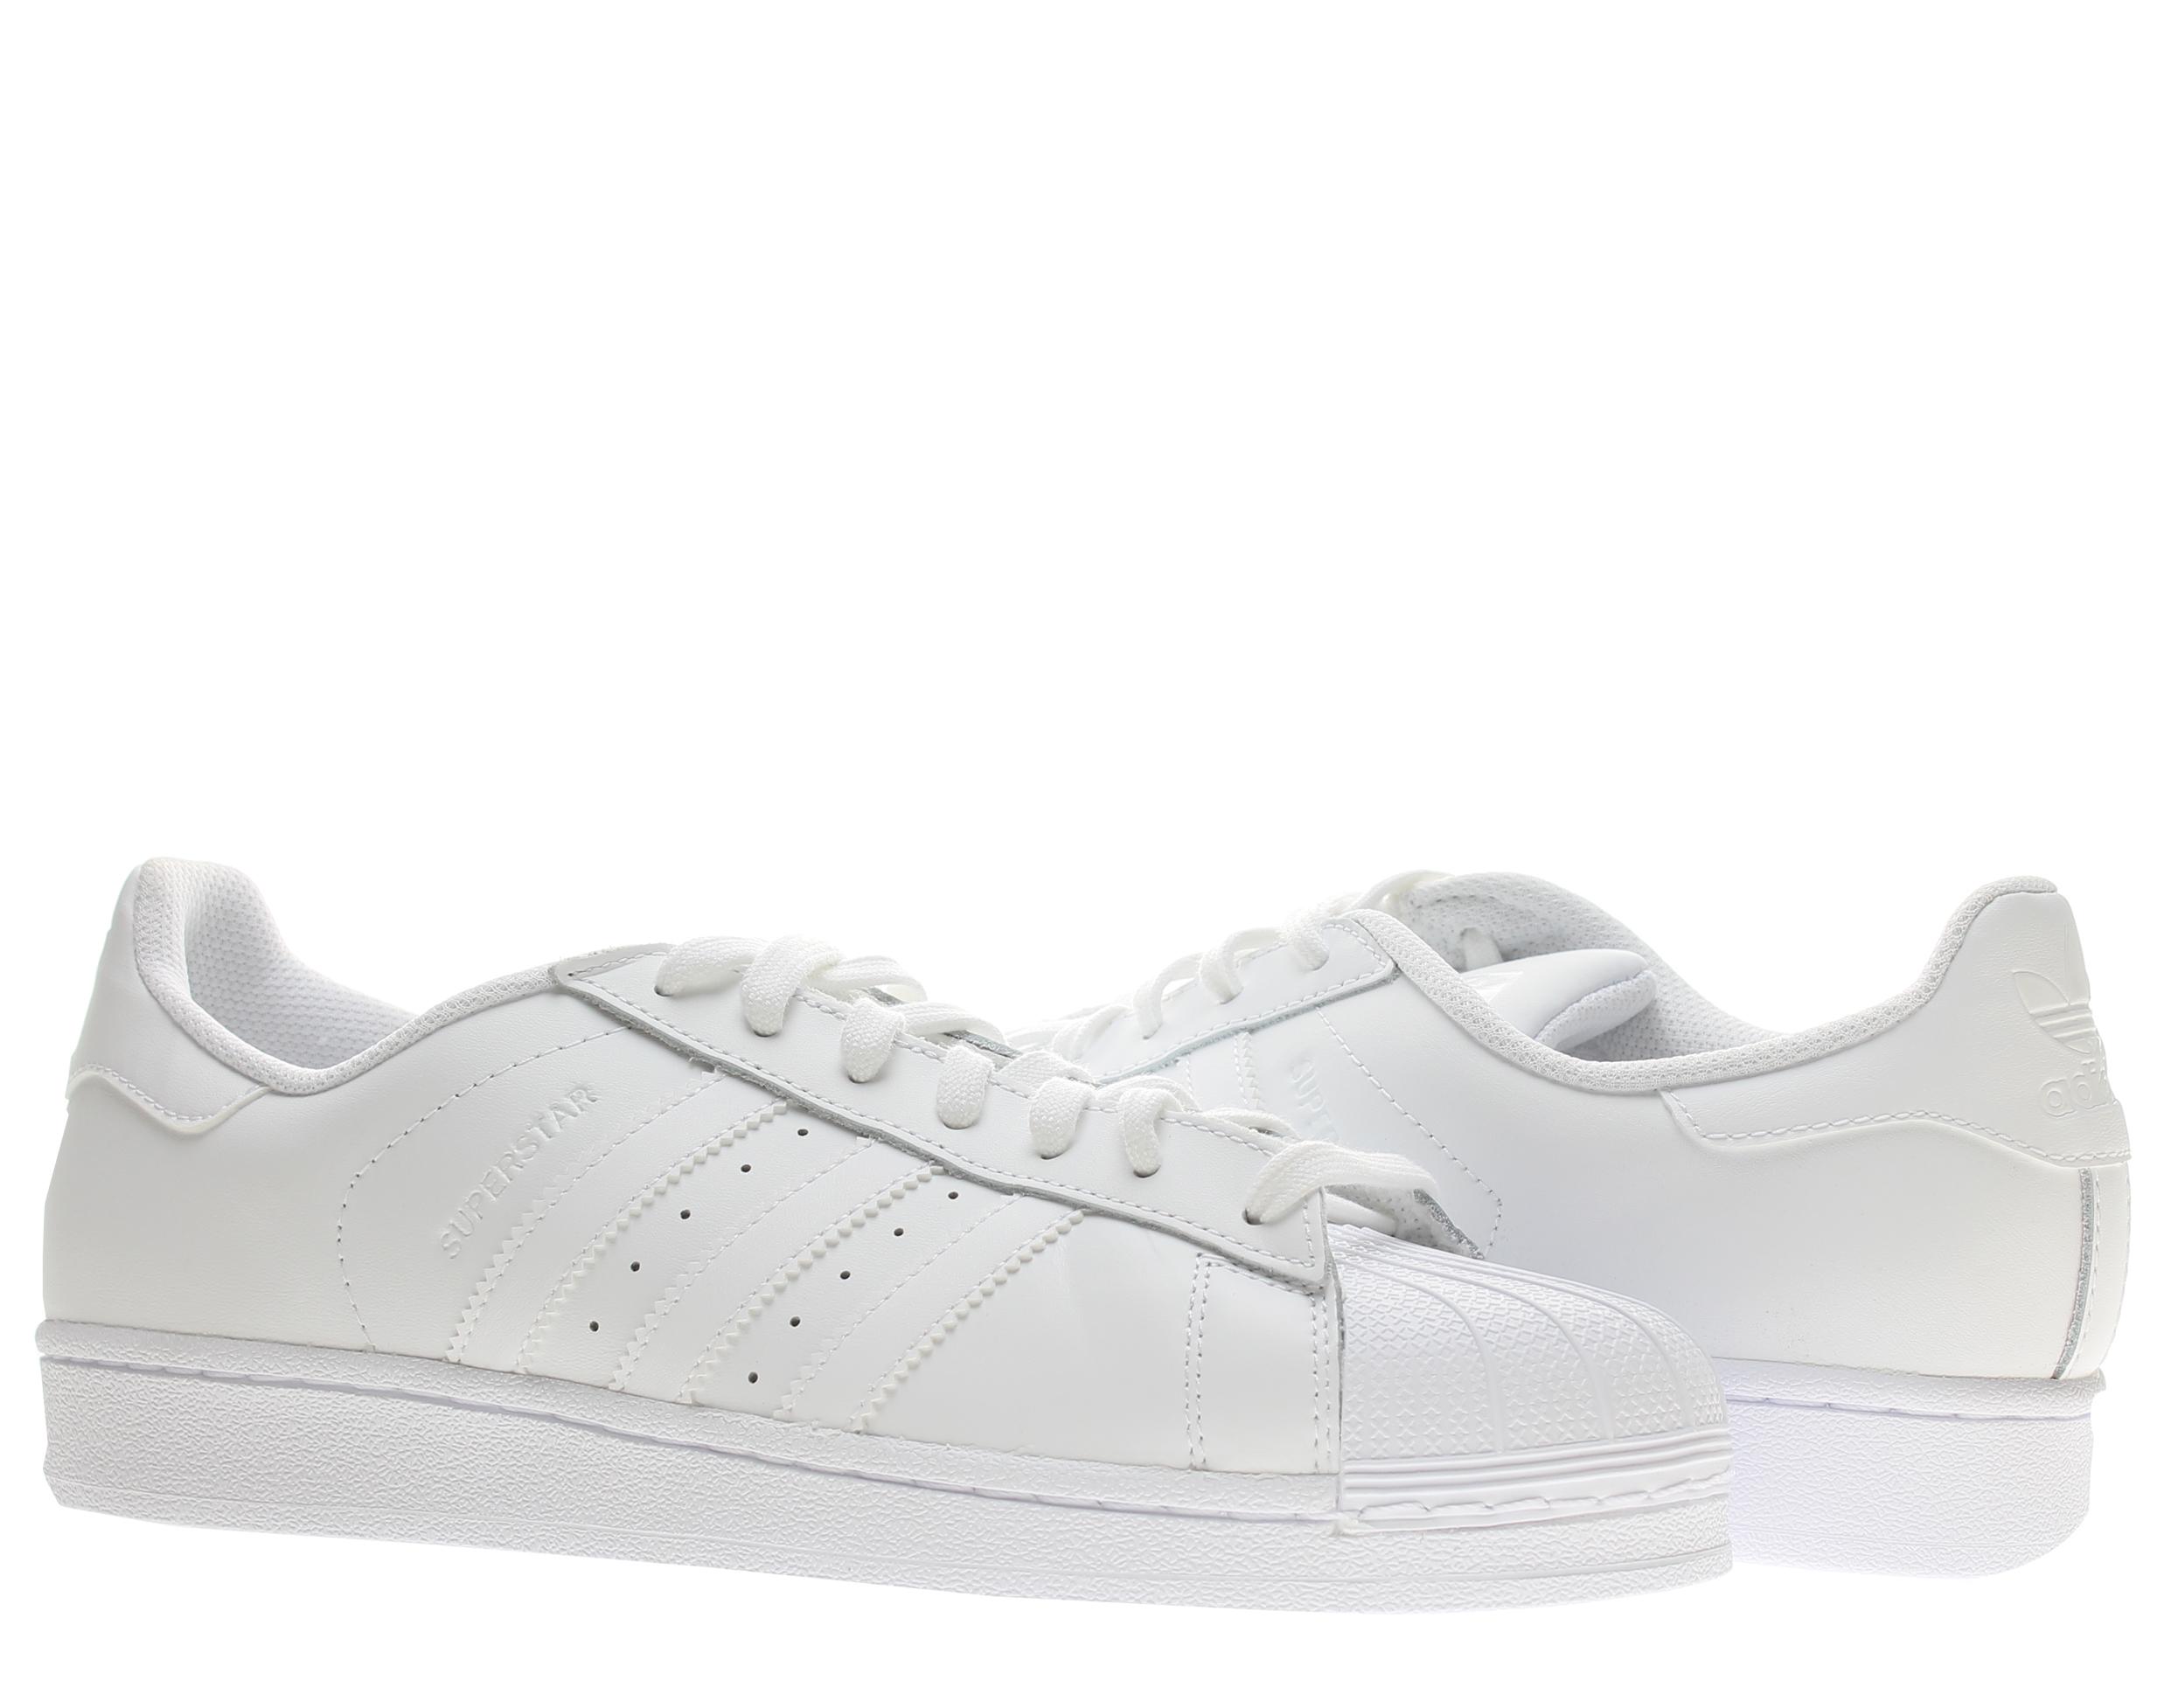 Adidas Originals Superstar Foundation White/White Men's Basketball ...